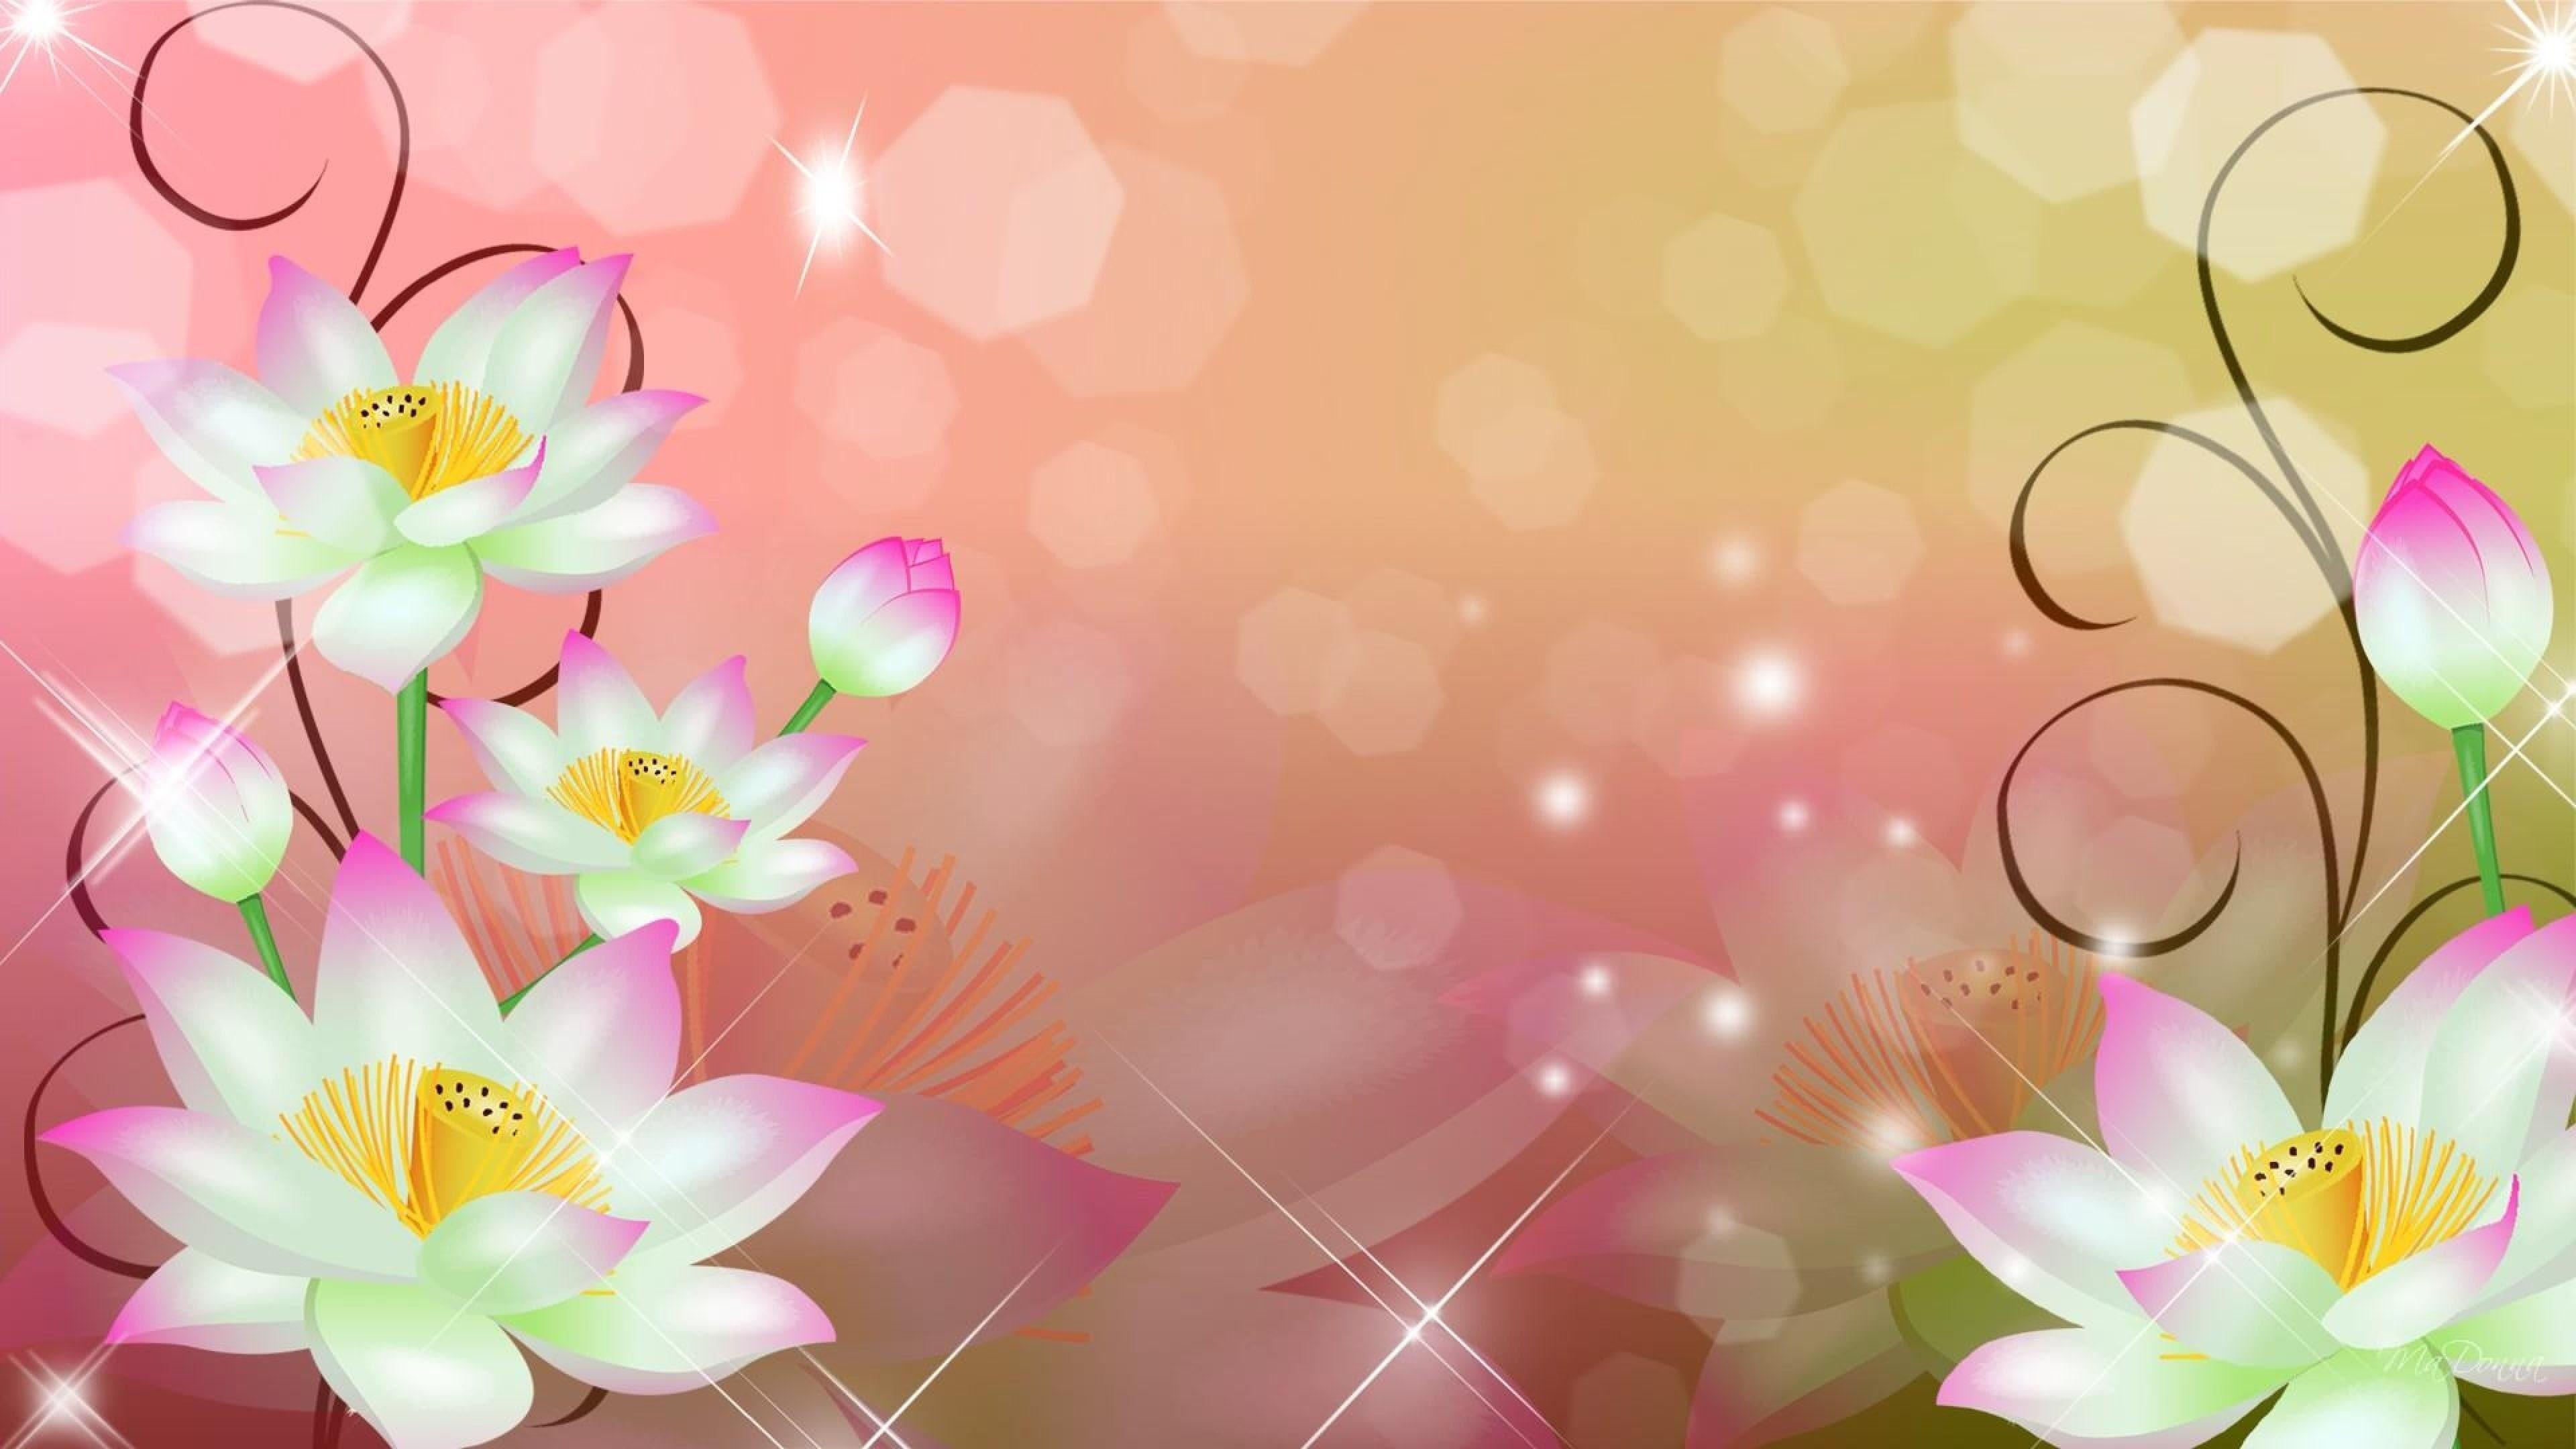 Lotus Hd Wallpaper 73 Images